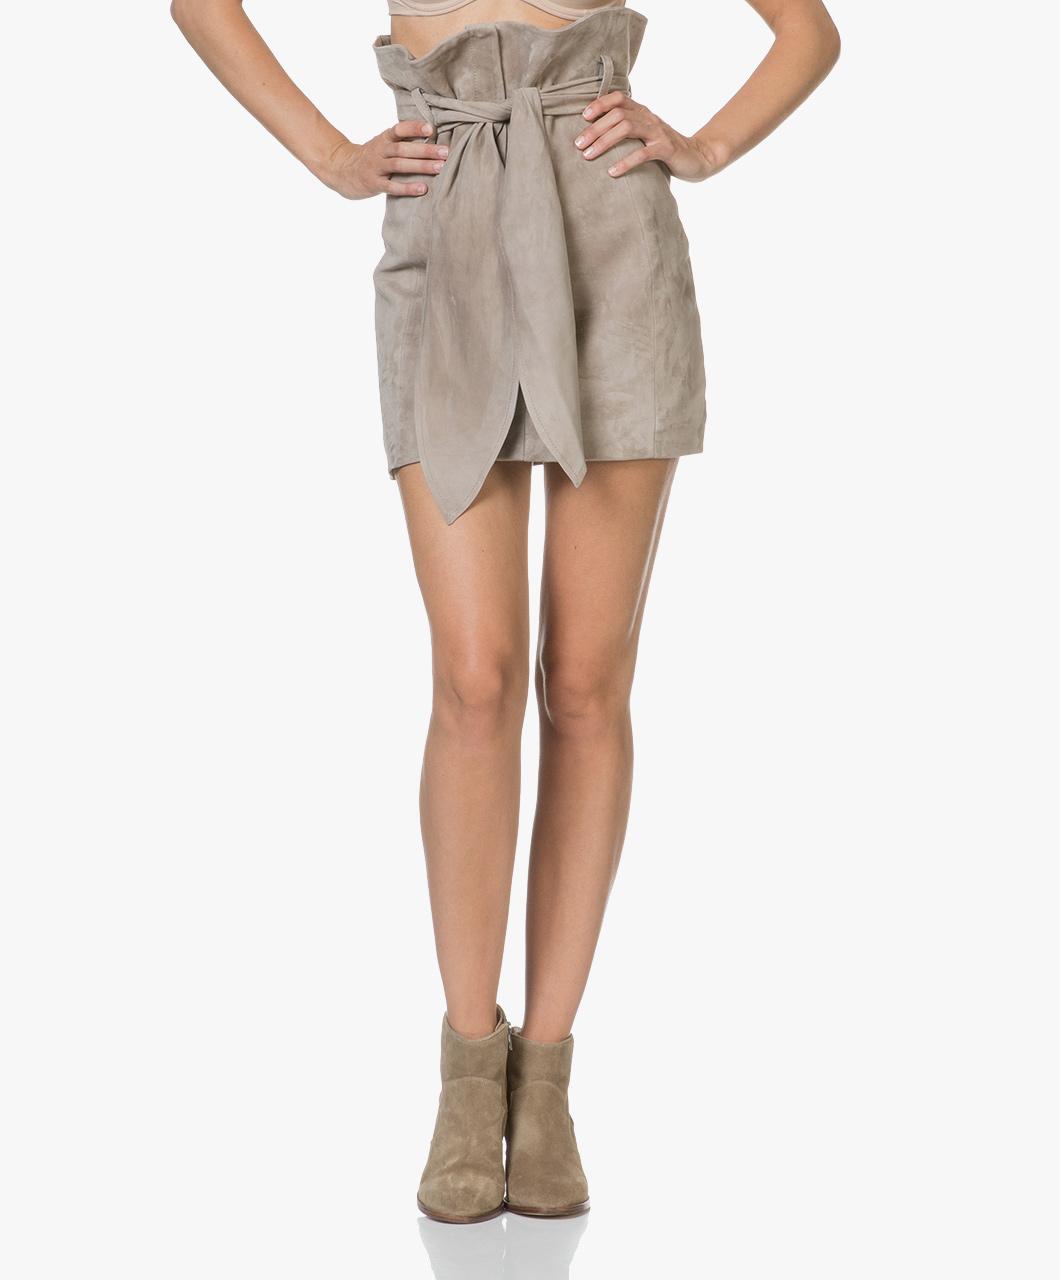 Uitgelezene IRO Brassi Suede Pencil Skirt with Tie Belt - Clay - 18wwp31brassi SG-29